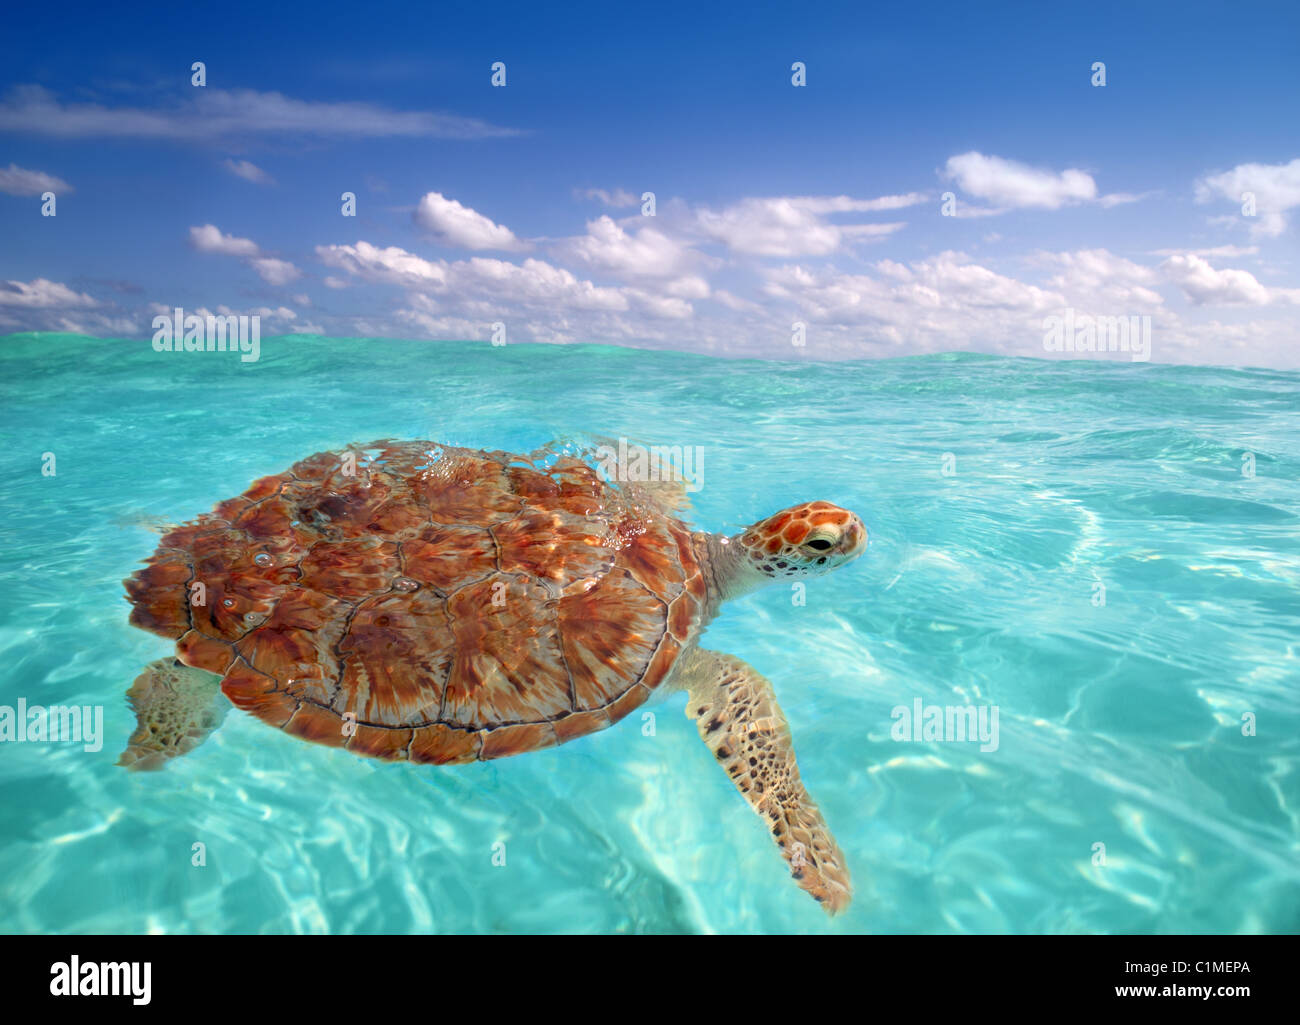 Tortuga verde Chelonia mydas mar Caribe Cheloniidae superficie de agua Imagen De Stock